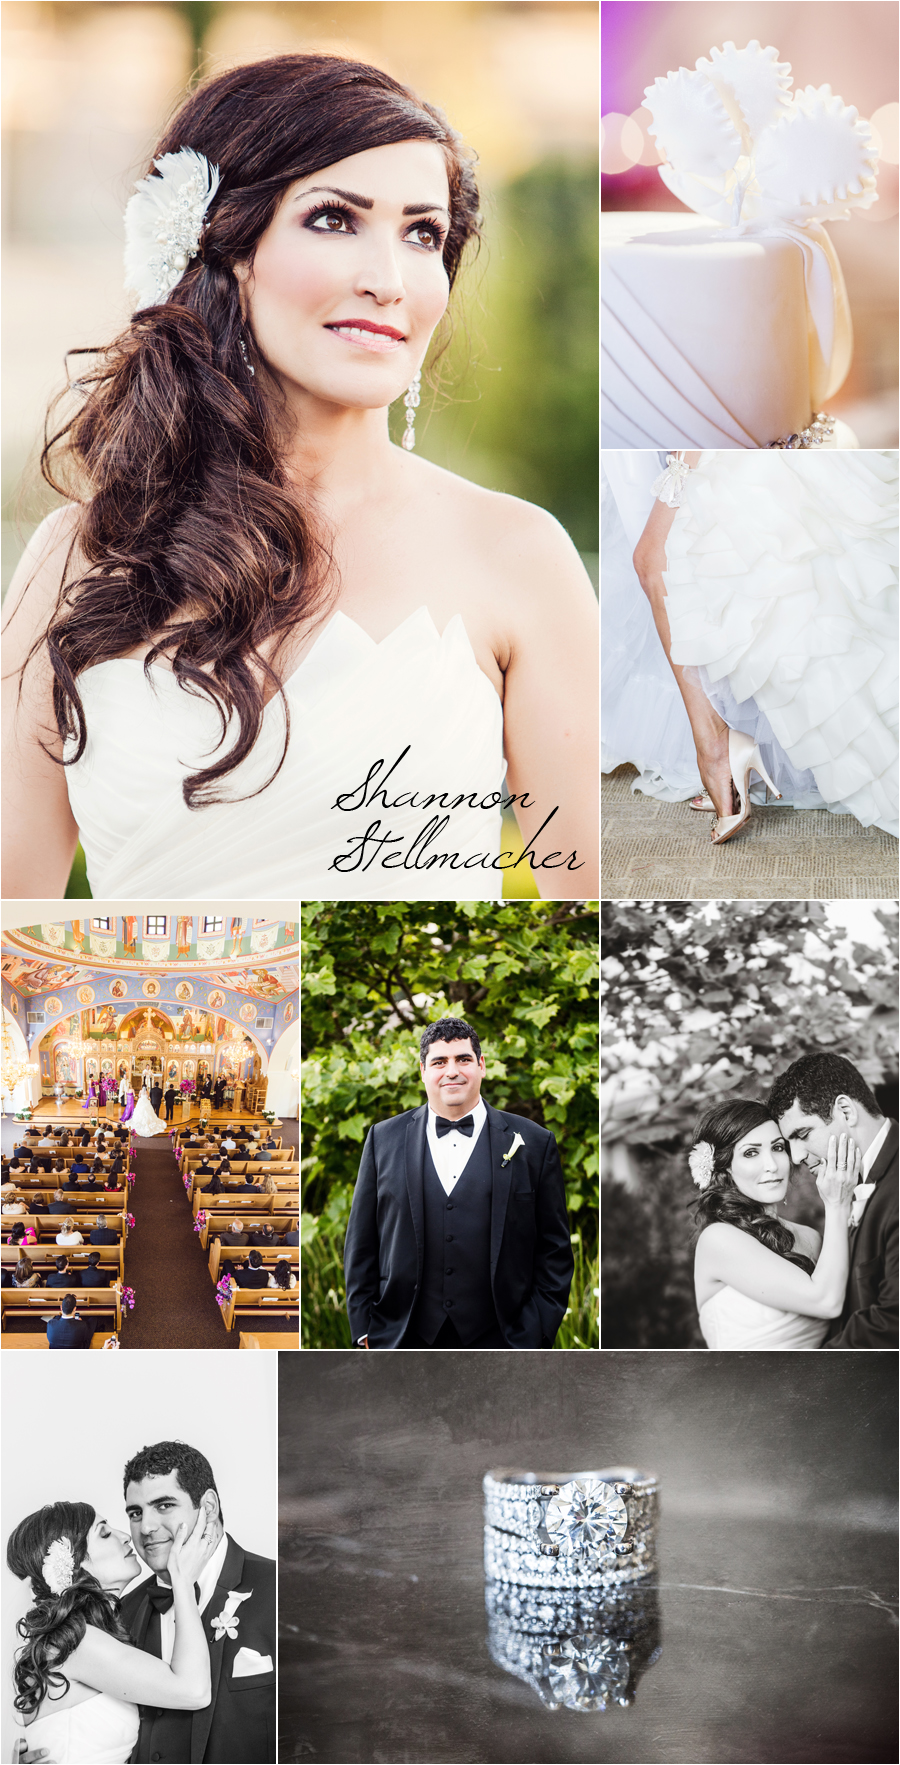 Middle-Eastern-Wedding-Photography.jpg